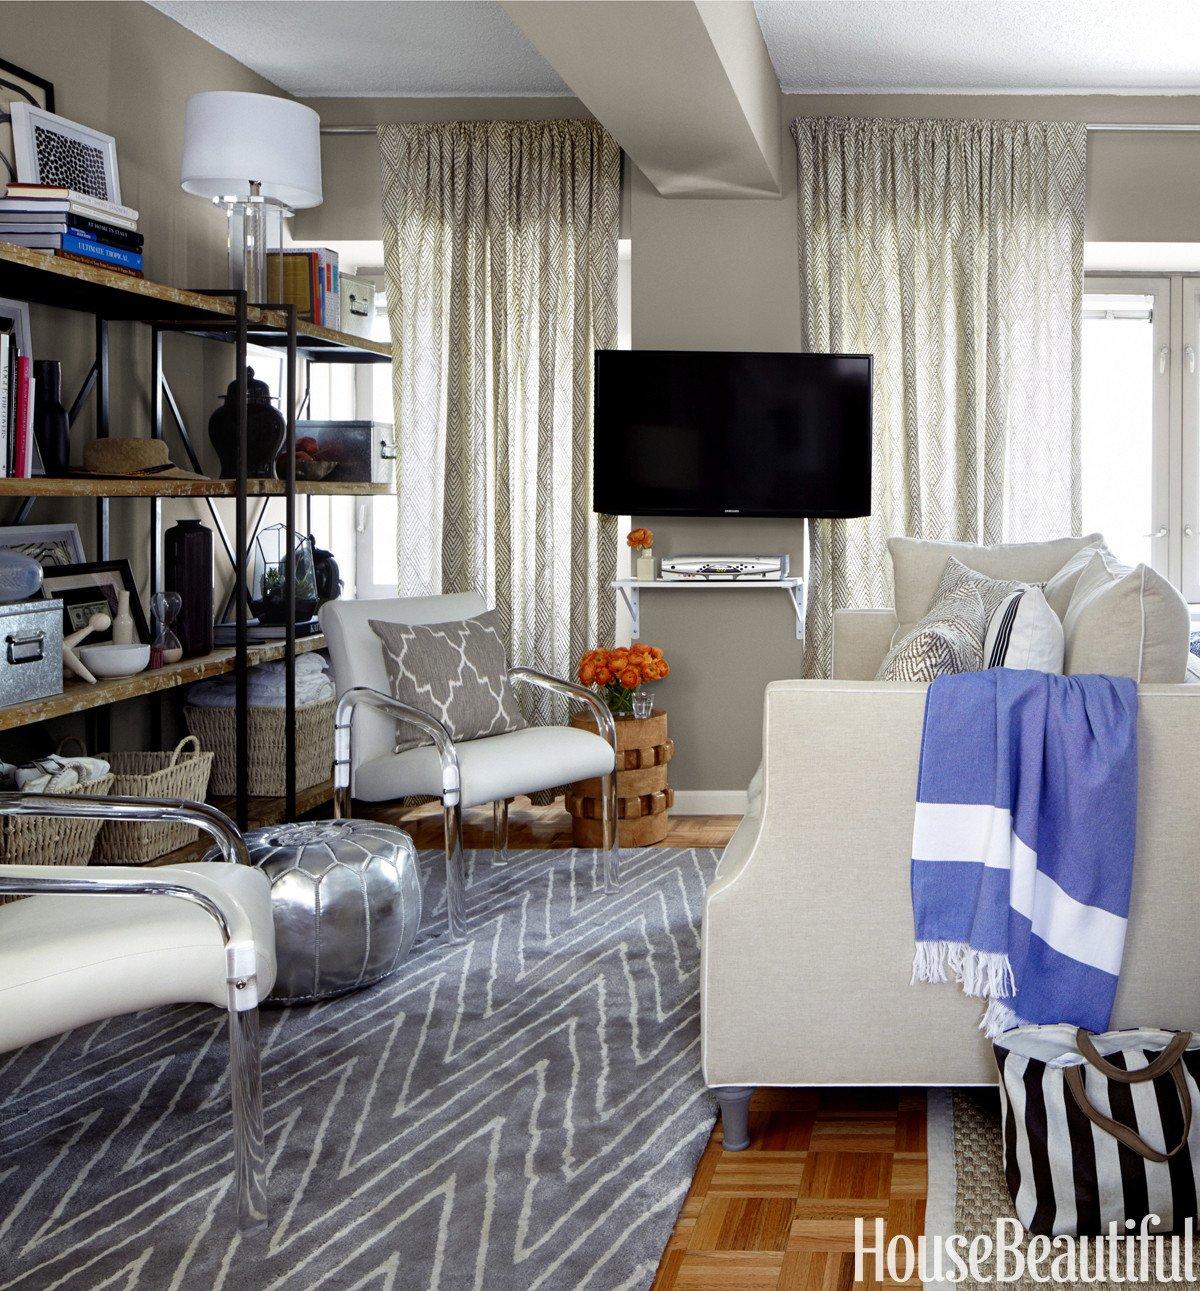 Small Apartment Living Room Decor Beautiful Small Living Room Decorating Ideas How to Arrange A